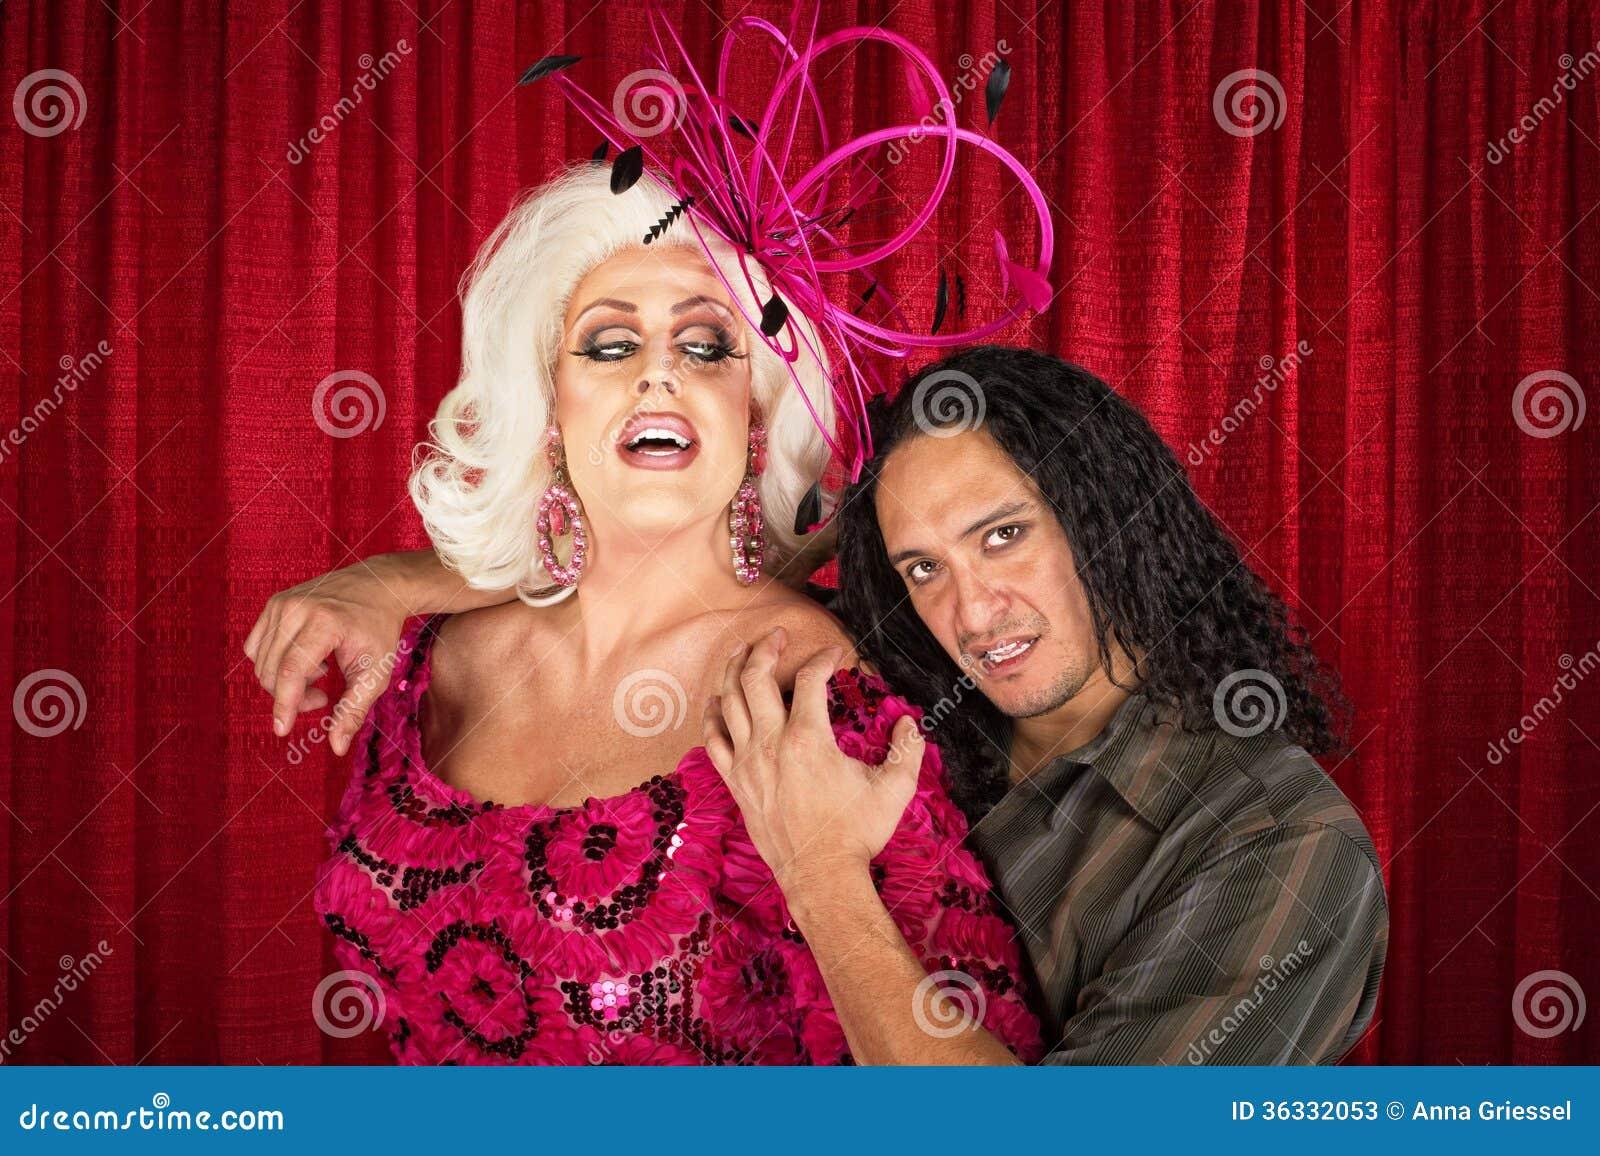 Download Sensual Odd Couple stock image. Image of dramatic, actress - 36332053